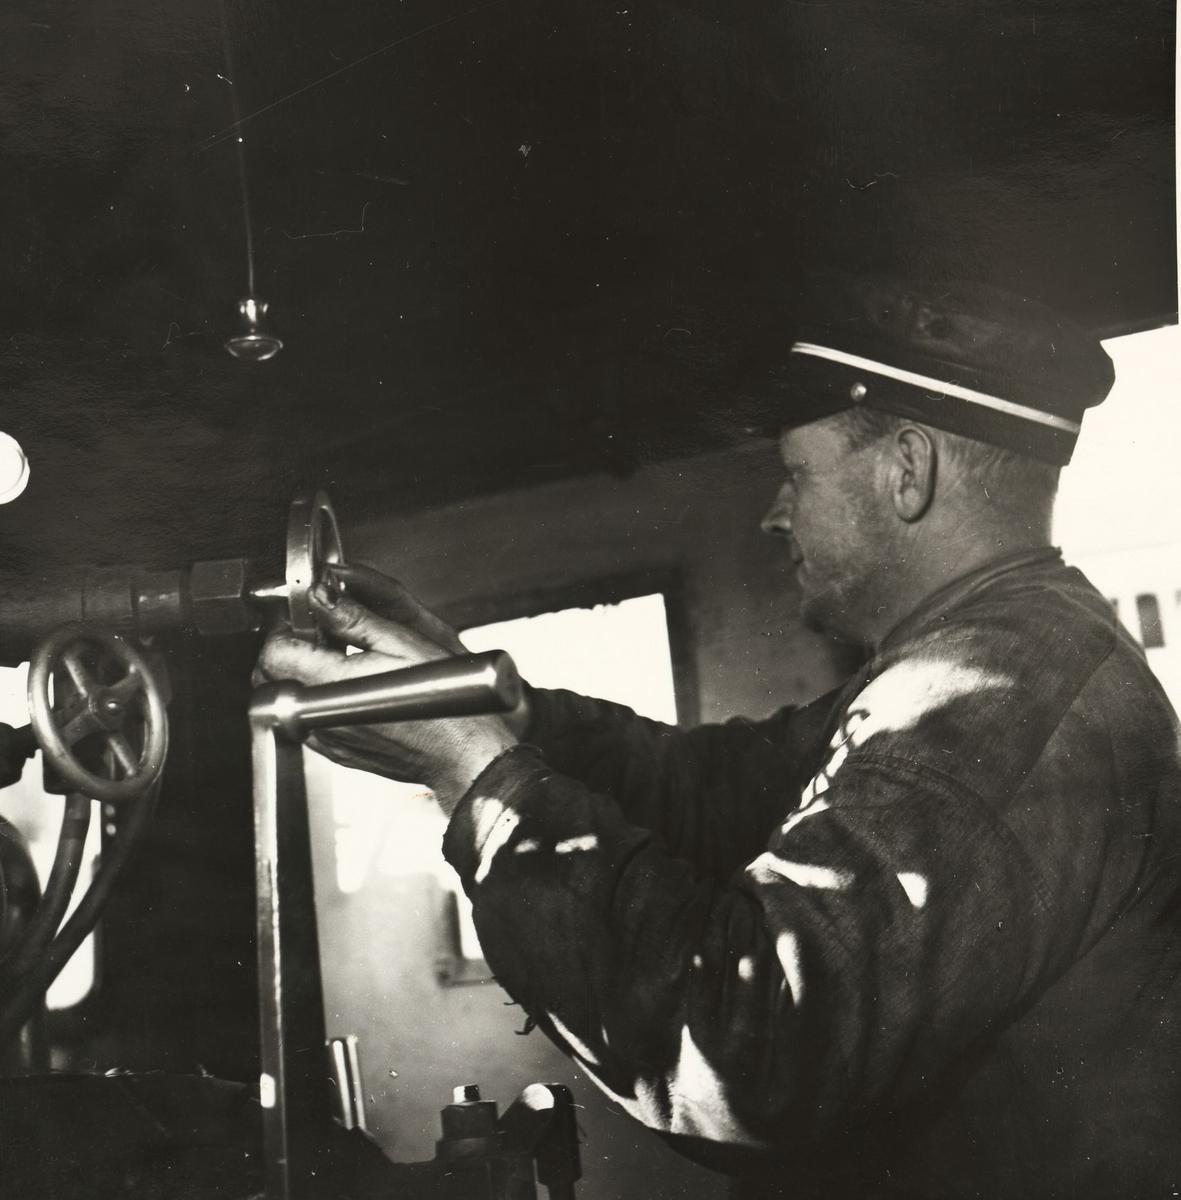 Lokomotivførerens arbeidsplass